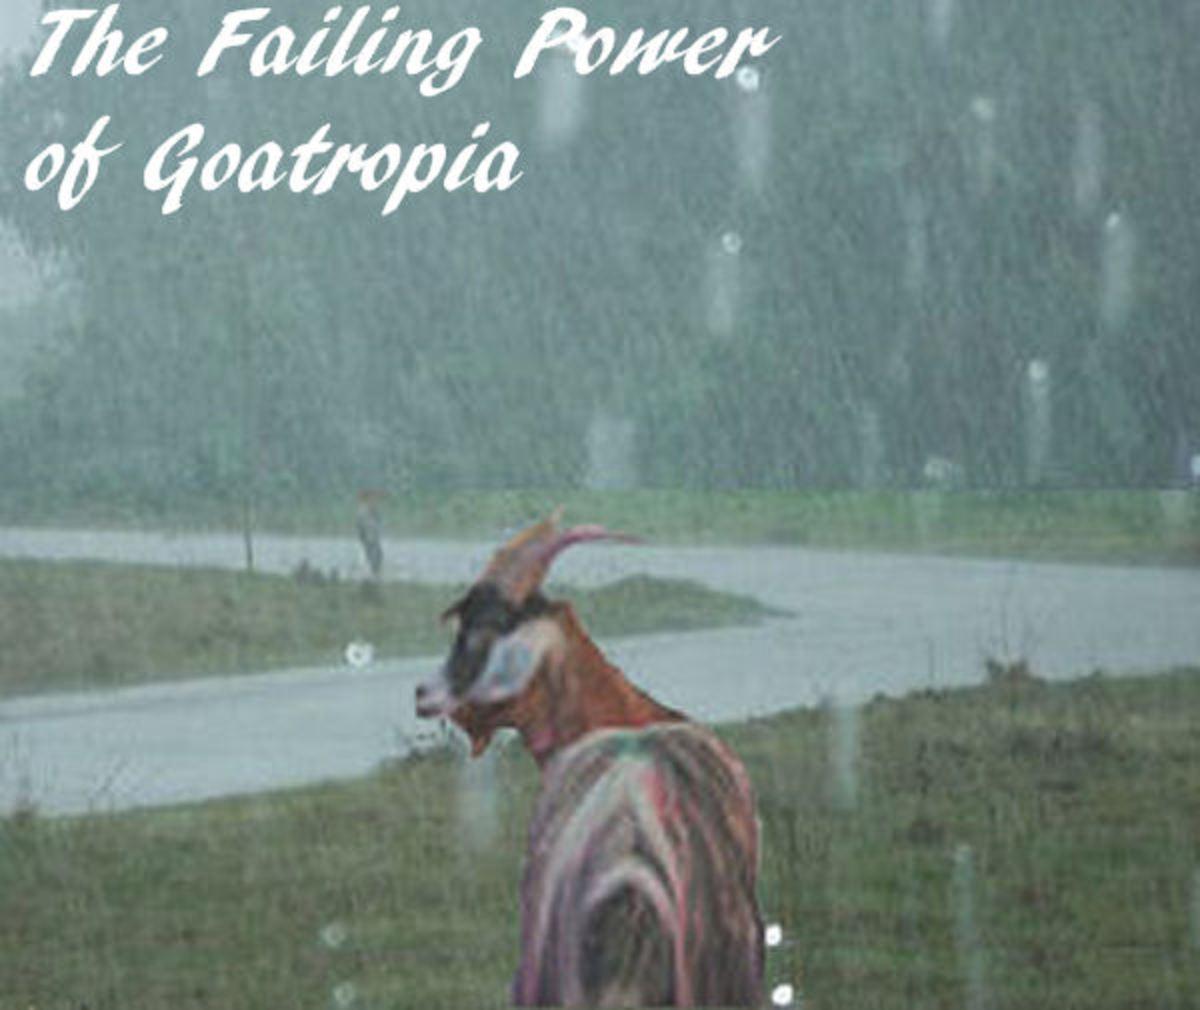 The Failing Power of Goatropia